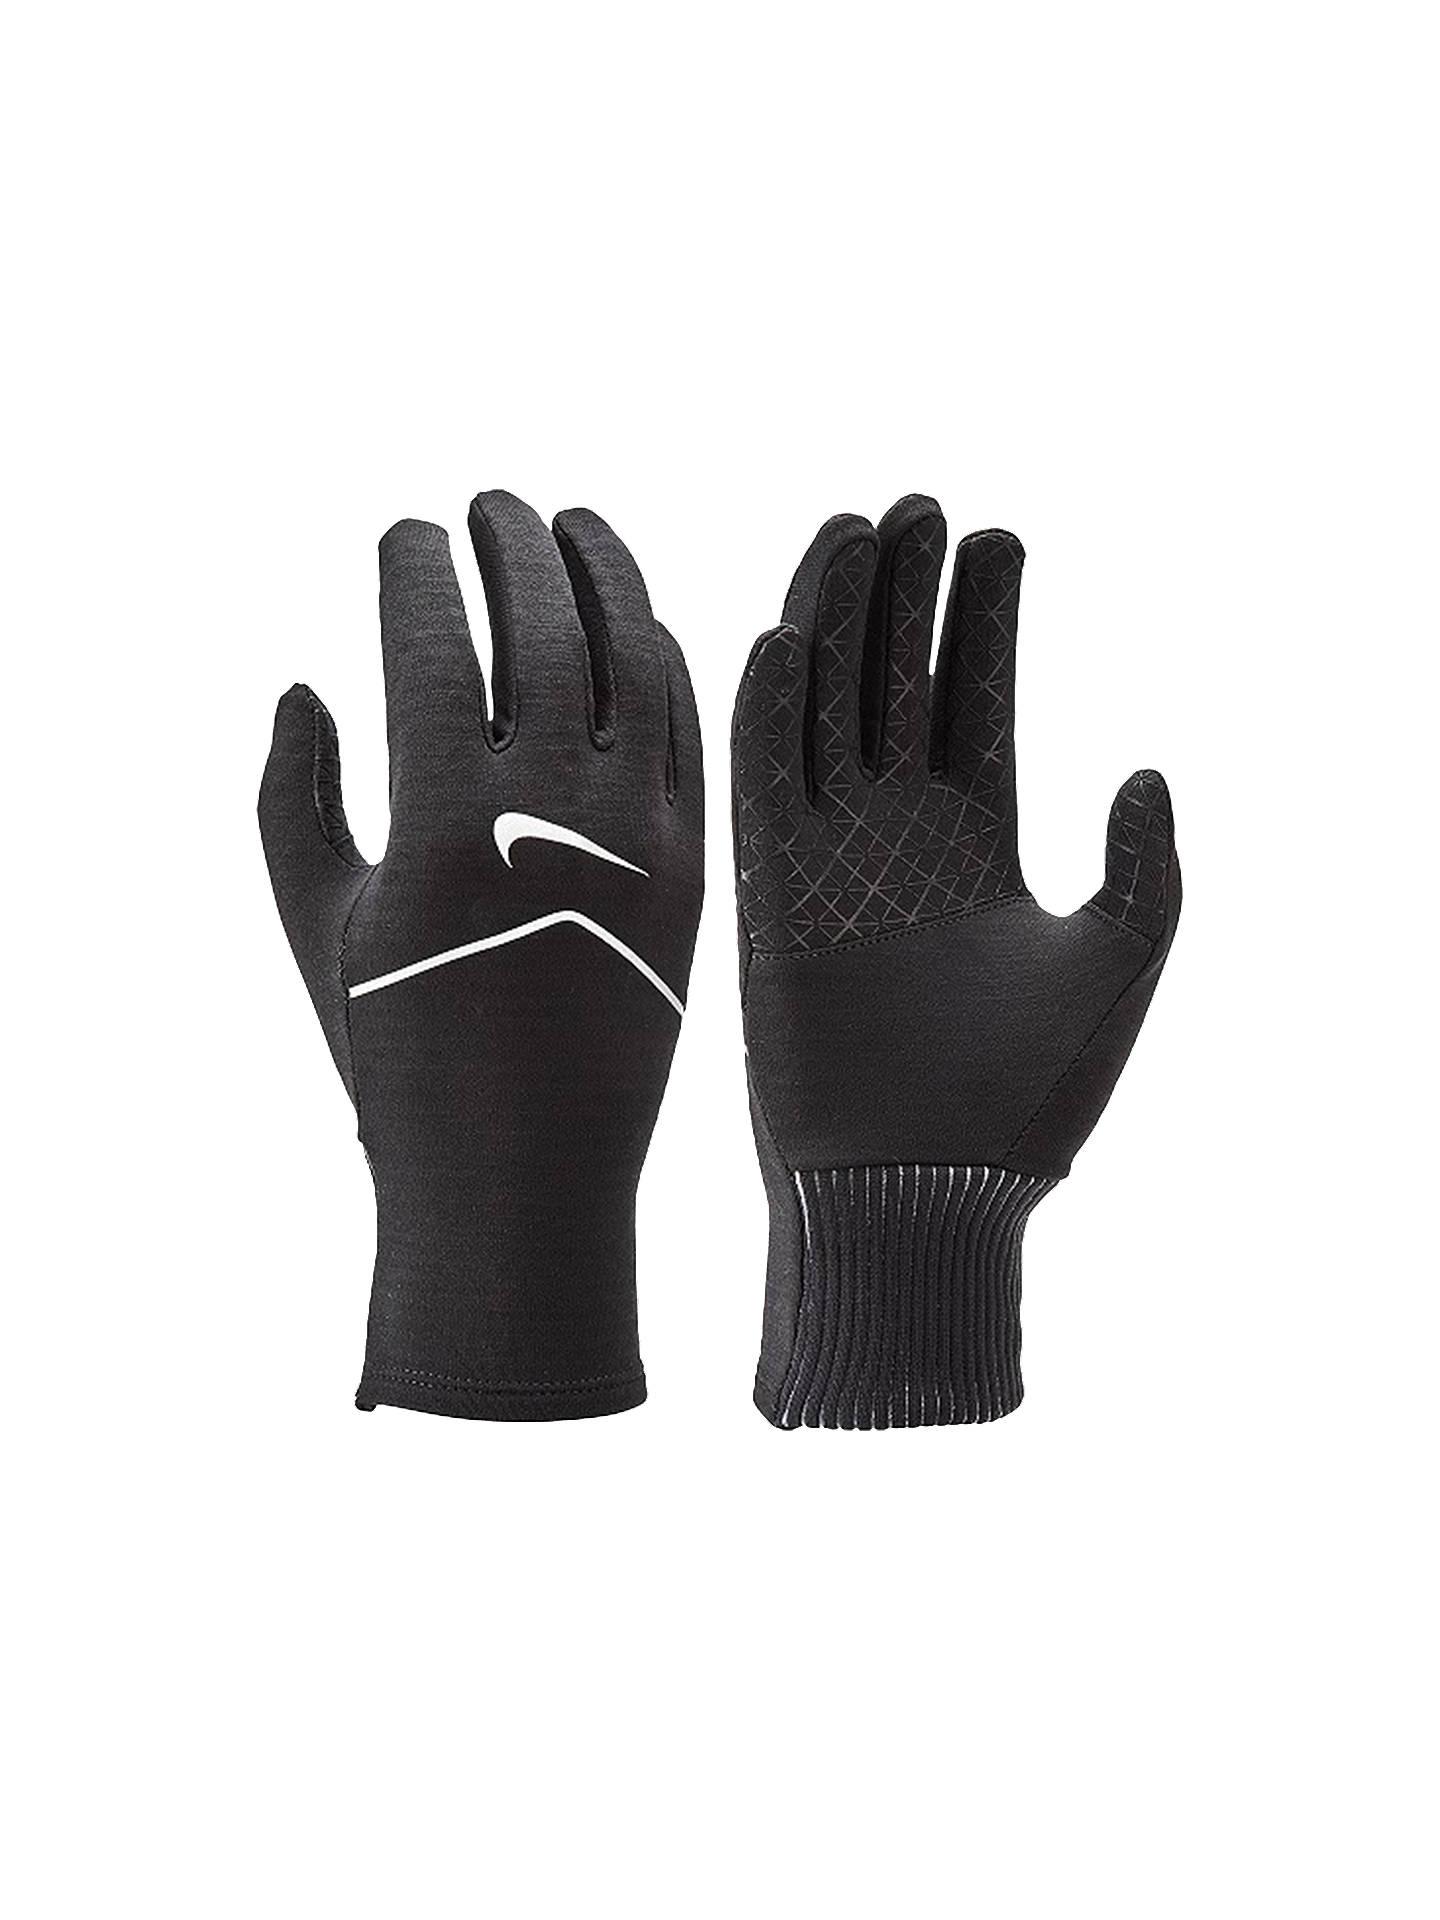 sale retailer aea98 abe3b Buy Nike Women s Sphere Running Gloves, Black Silver, S Online at johnlewis.